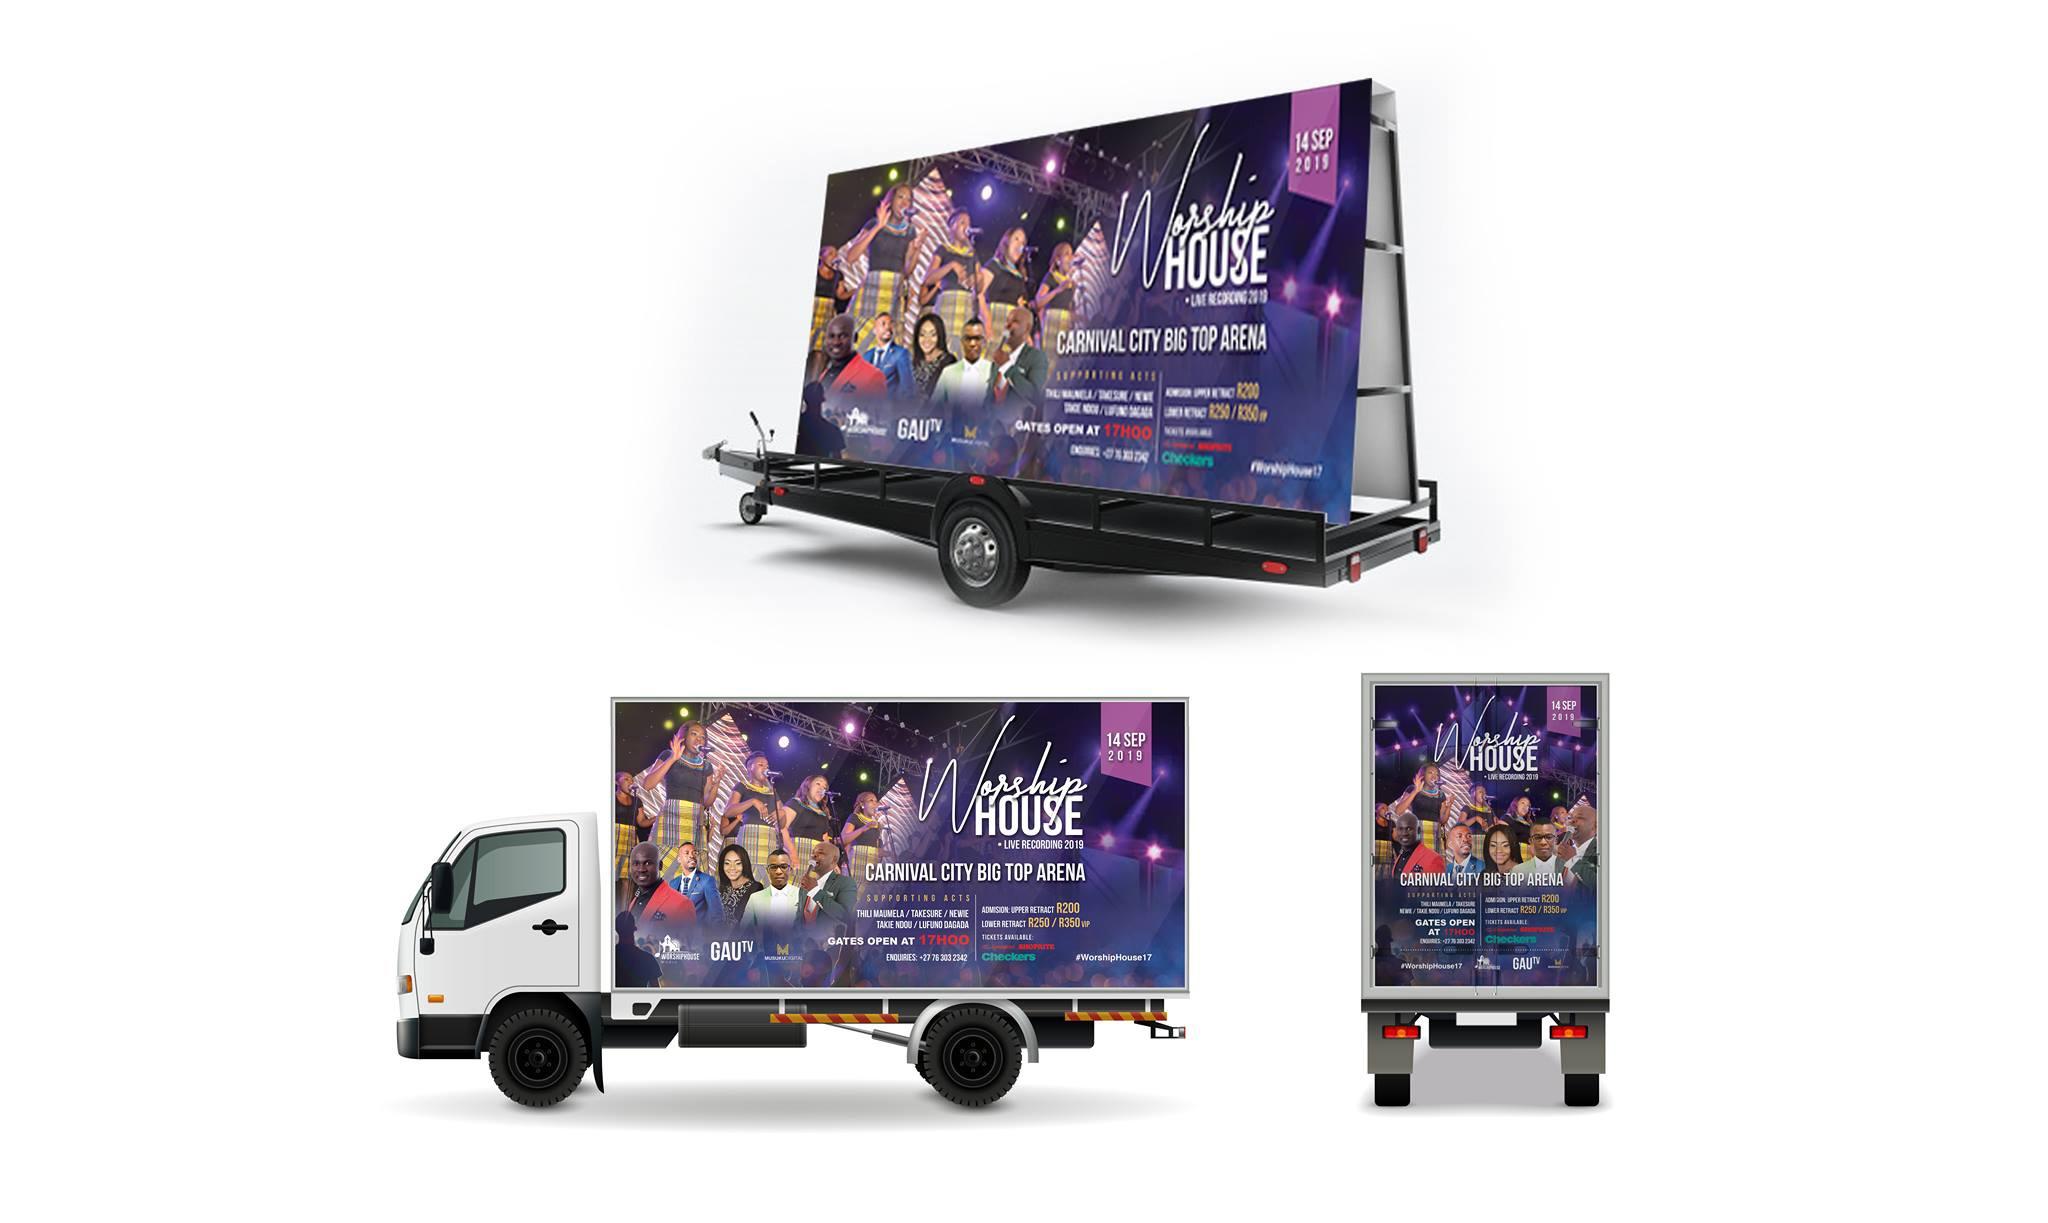 Worship House Concert Branding